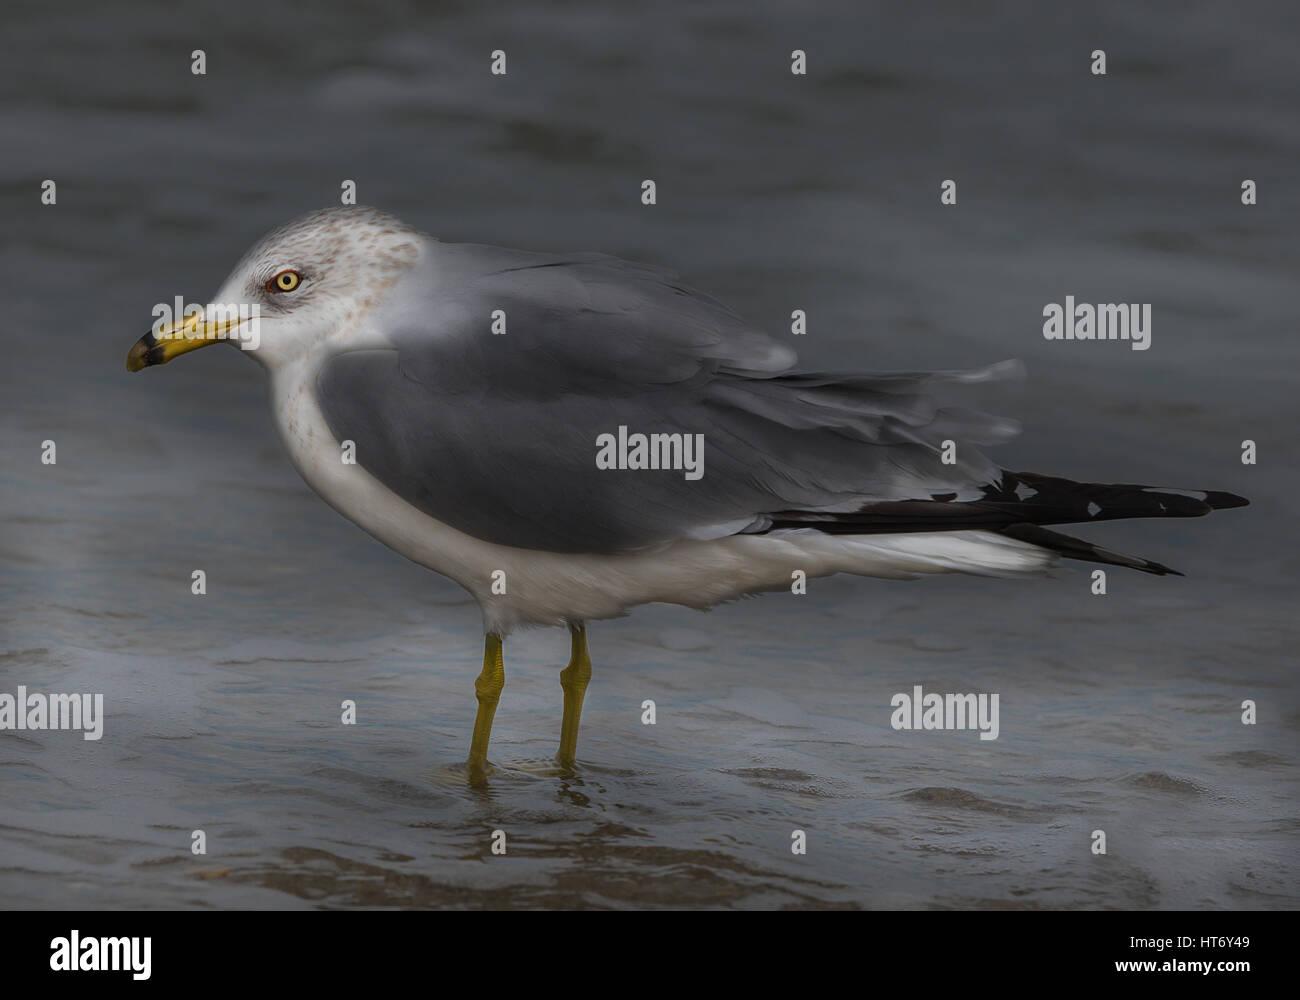 Grumpy Seagull Portrait - Stock Image